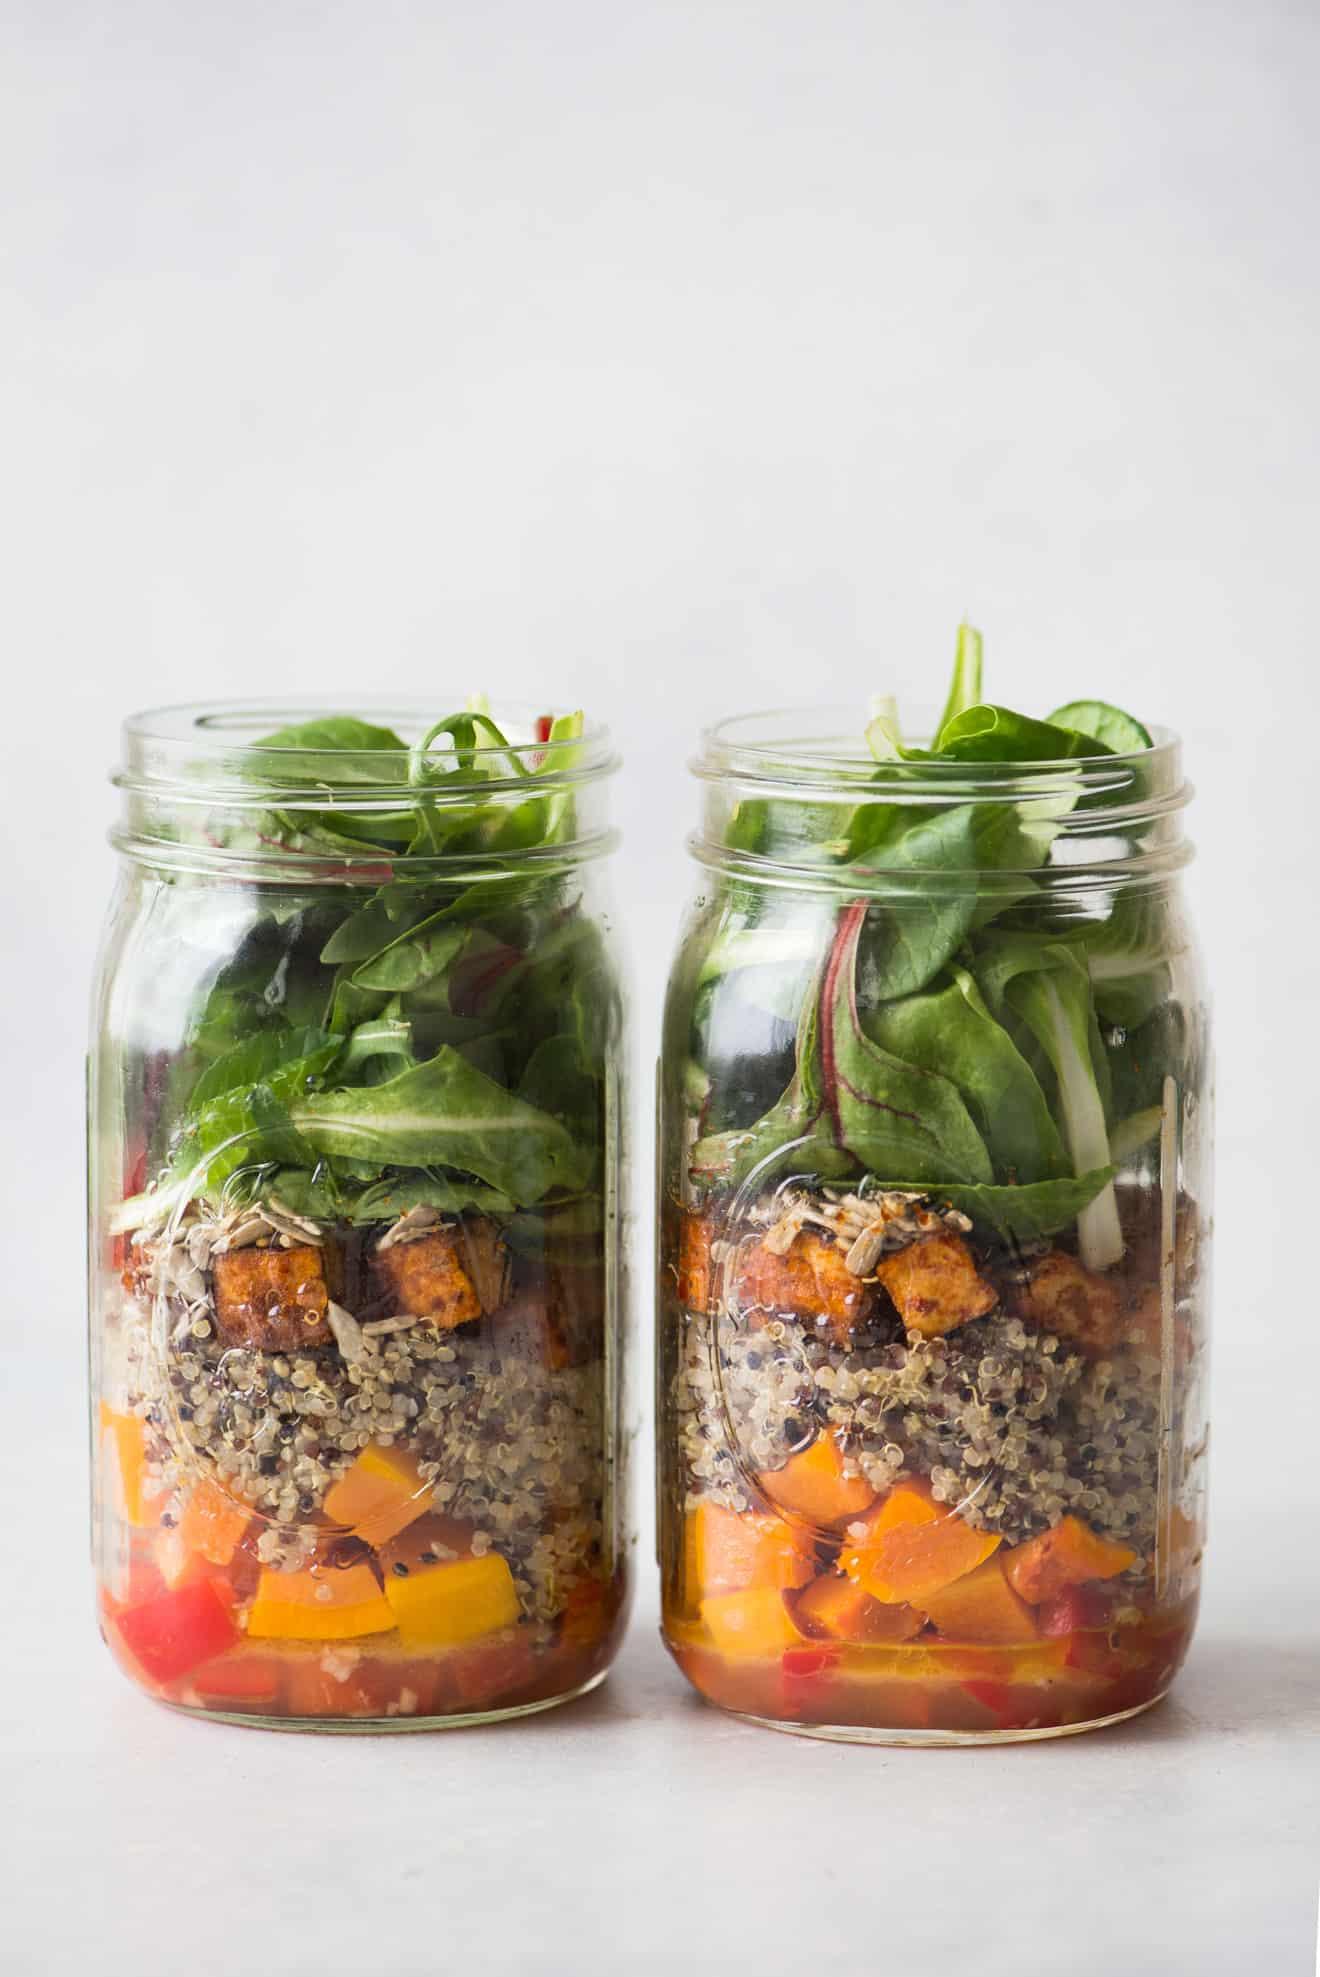 Mason Jar Salad with Red Curry Tofu, Quinoa and Butternut Squash